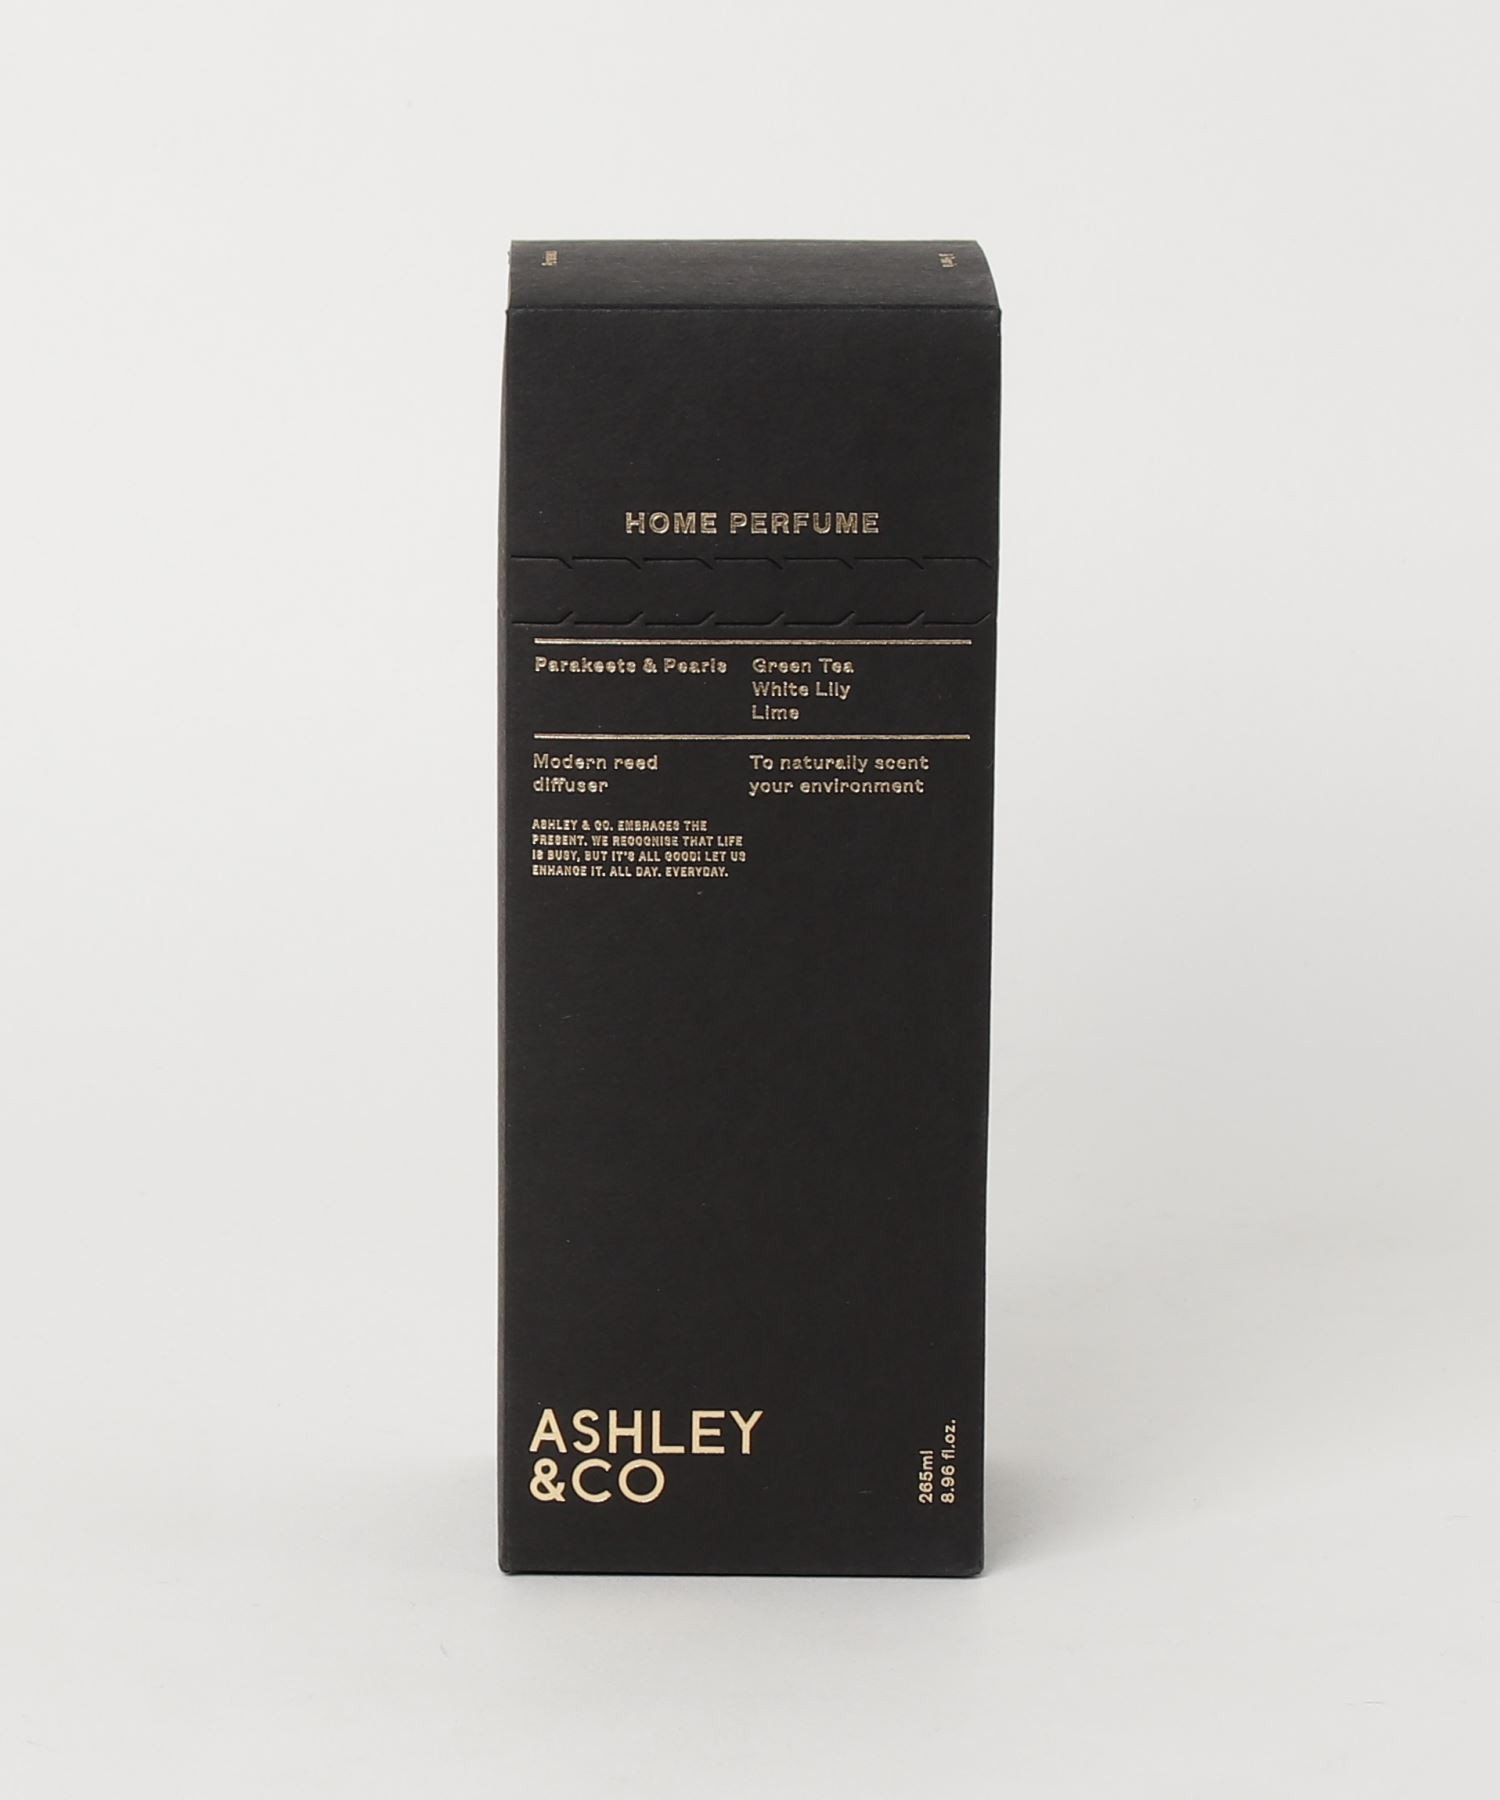 ASHLEY & CO ディフューザー Parakeets & Pearls 265ml